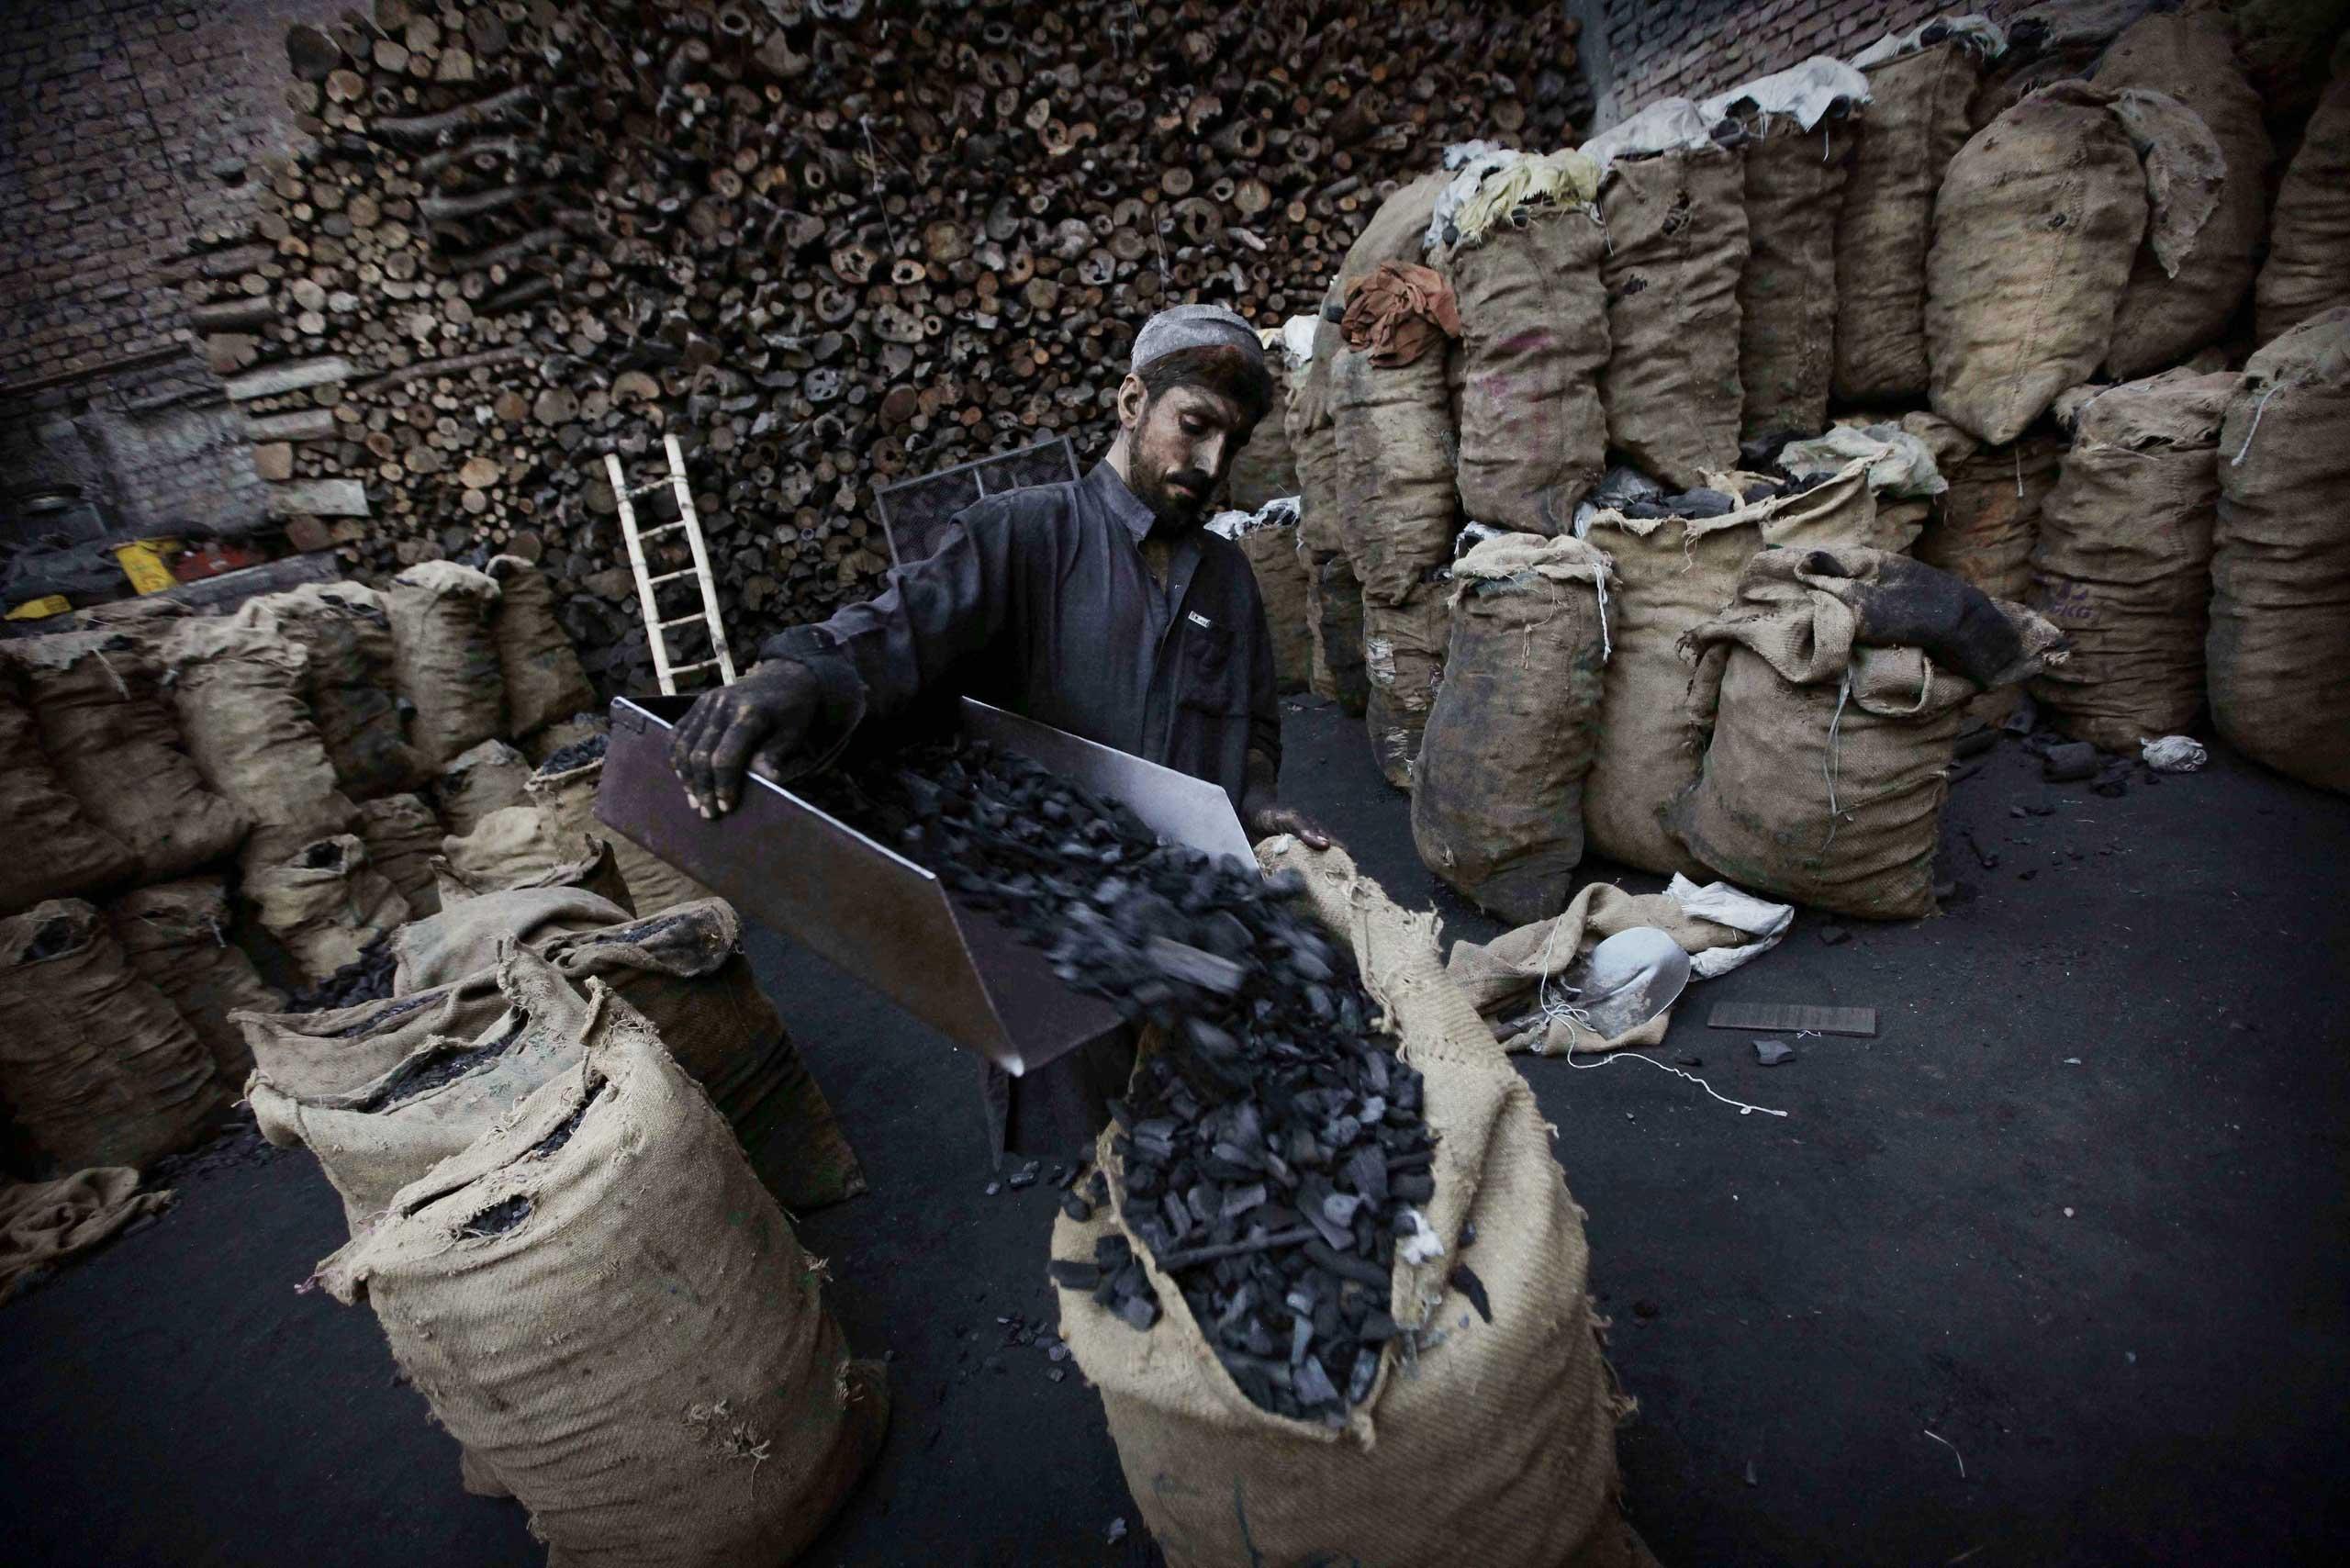 Oct. 30, 2014. A laborer sells coal in Peshawar, Pakistan.